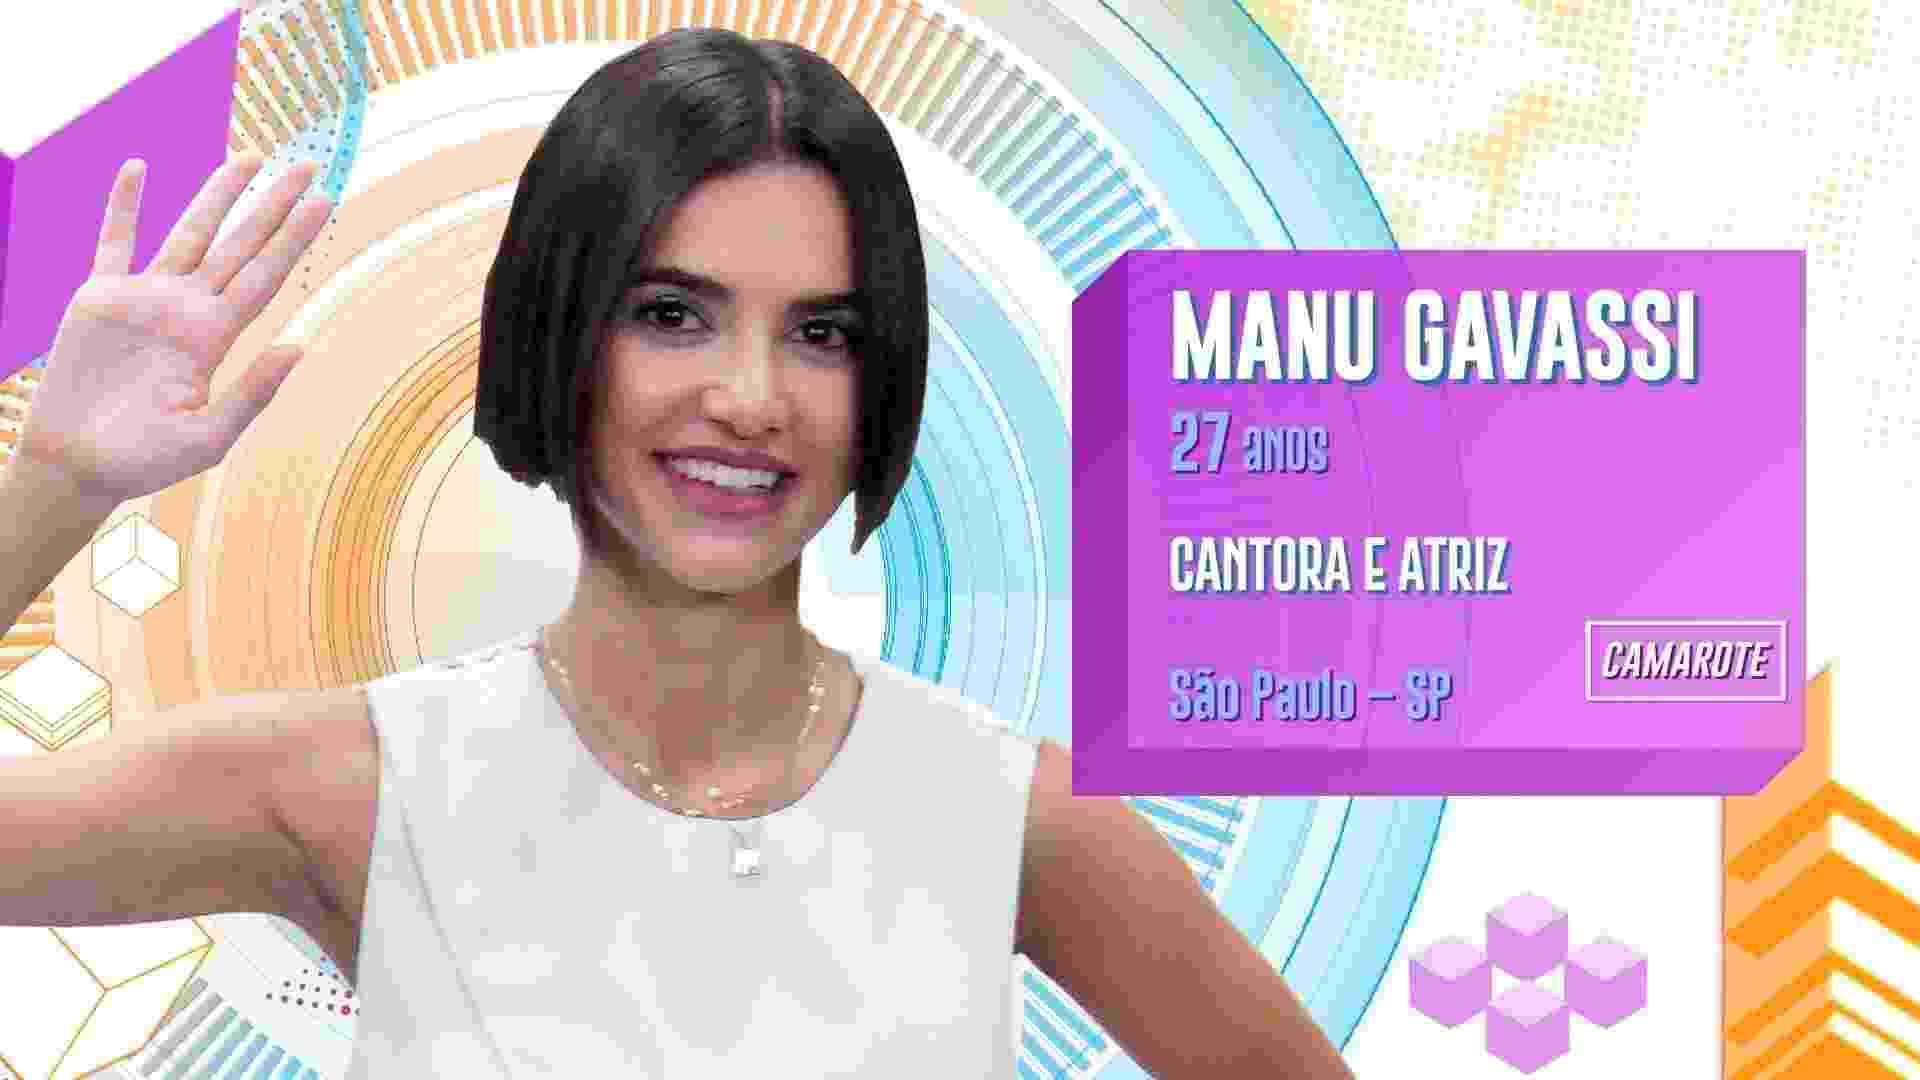 bbb20 - manu gavassi - Divulgação/TV Globo